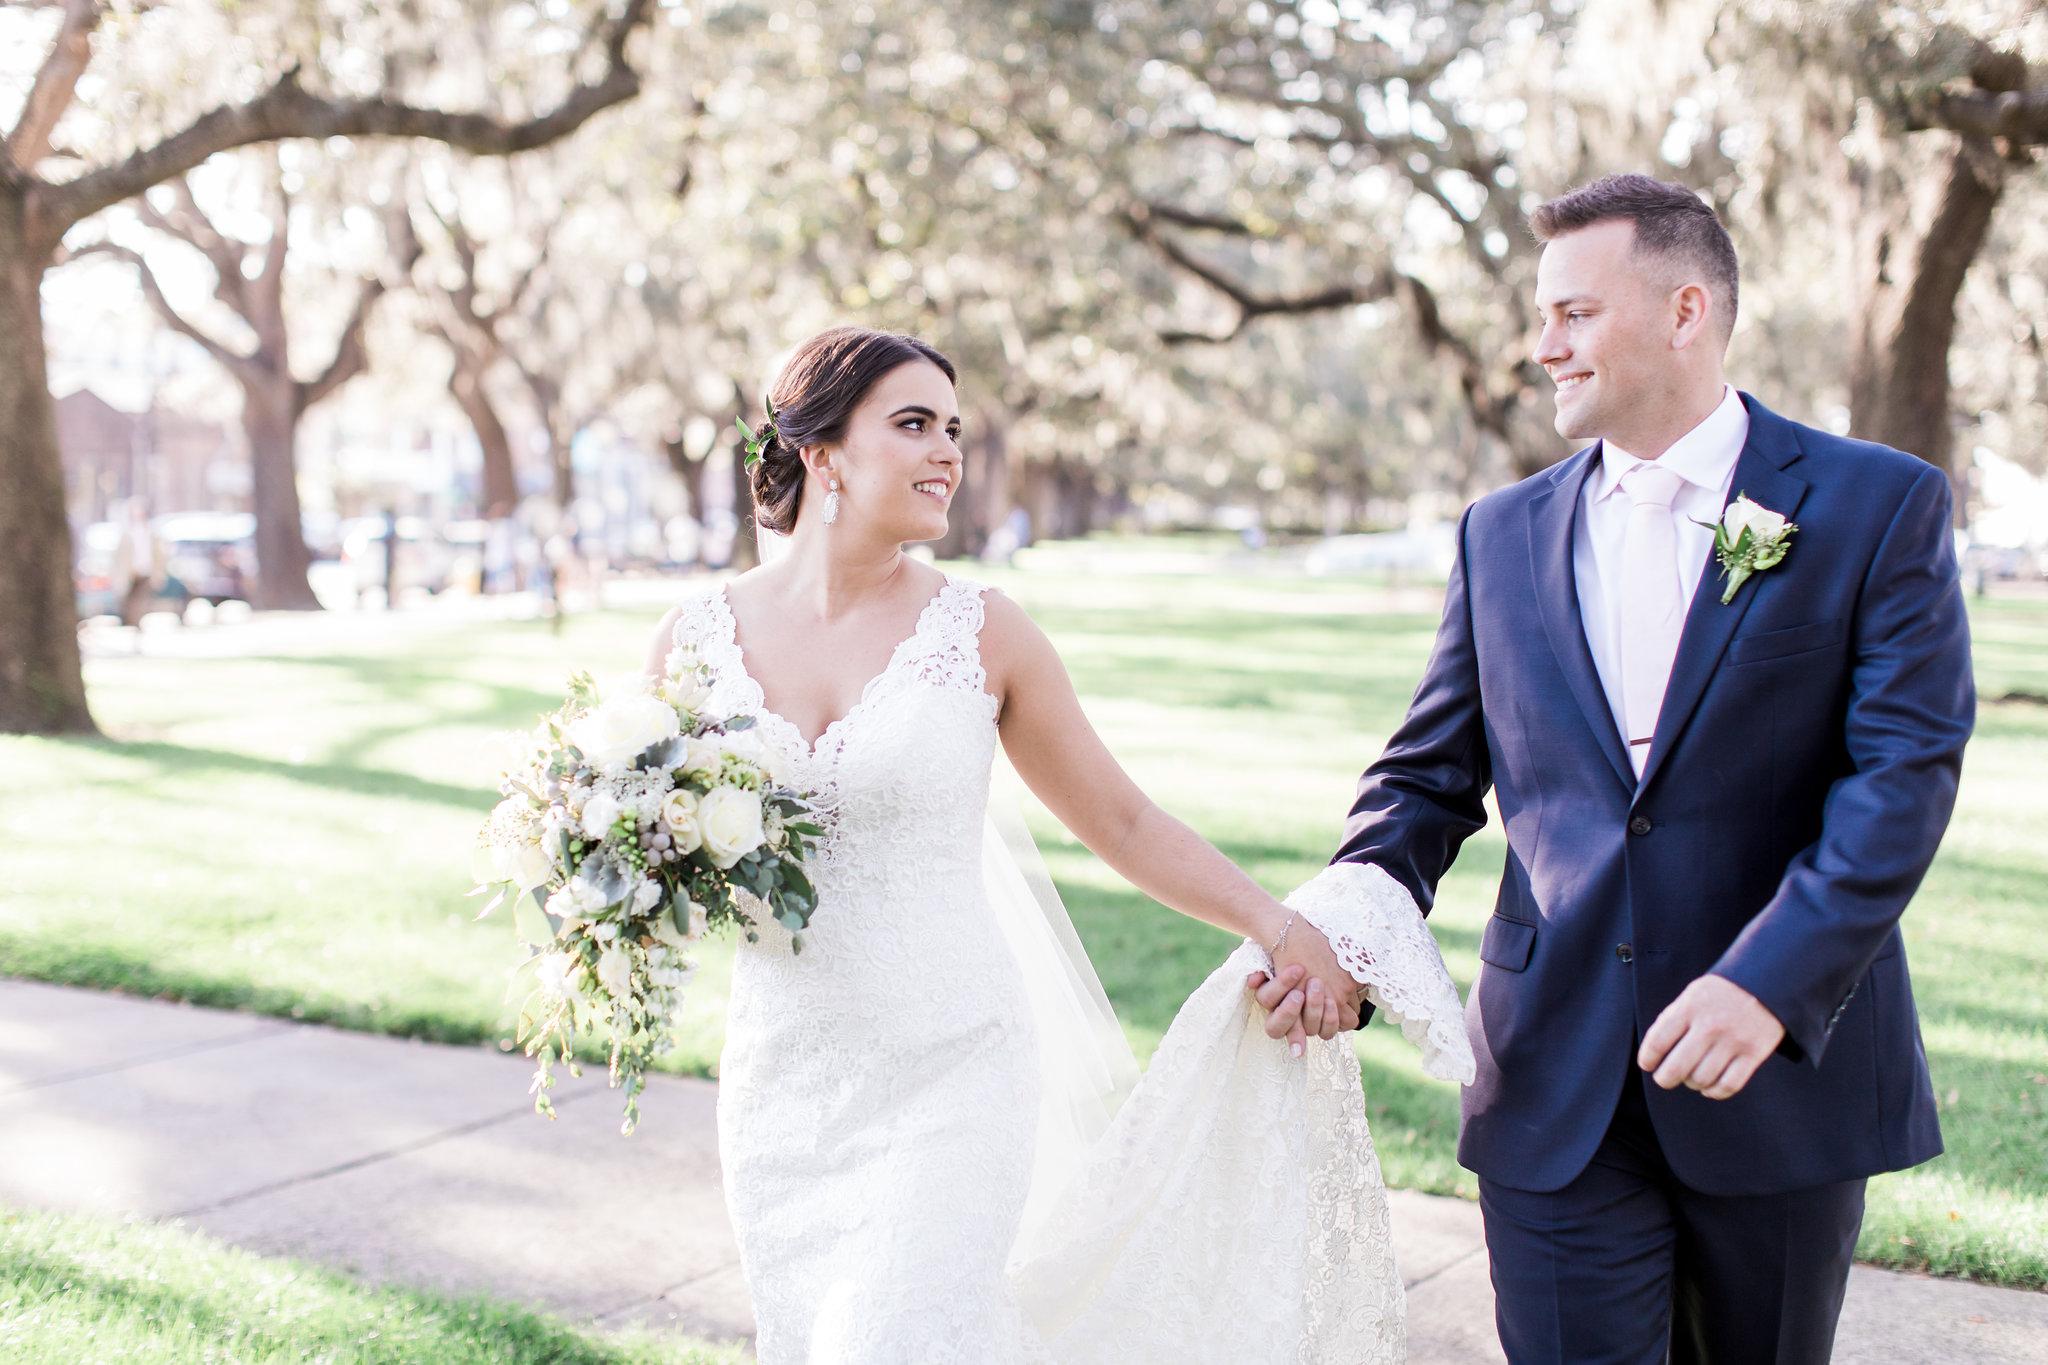 apt-b-photography-Savannah-wedding-photographer-savannah-engagement-photographer-historic-savannah-engagement-charles-h-morris-center-wedding-savannah-weddings-23.JPG